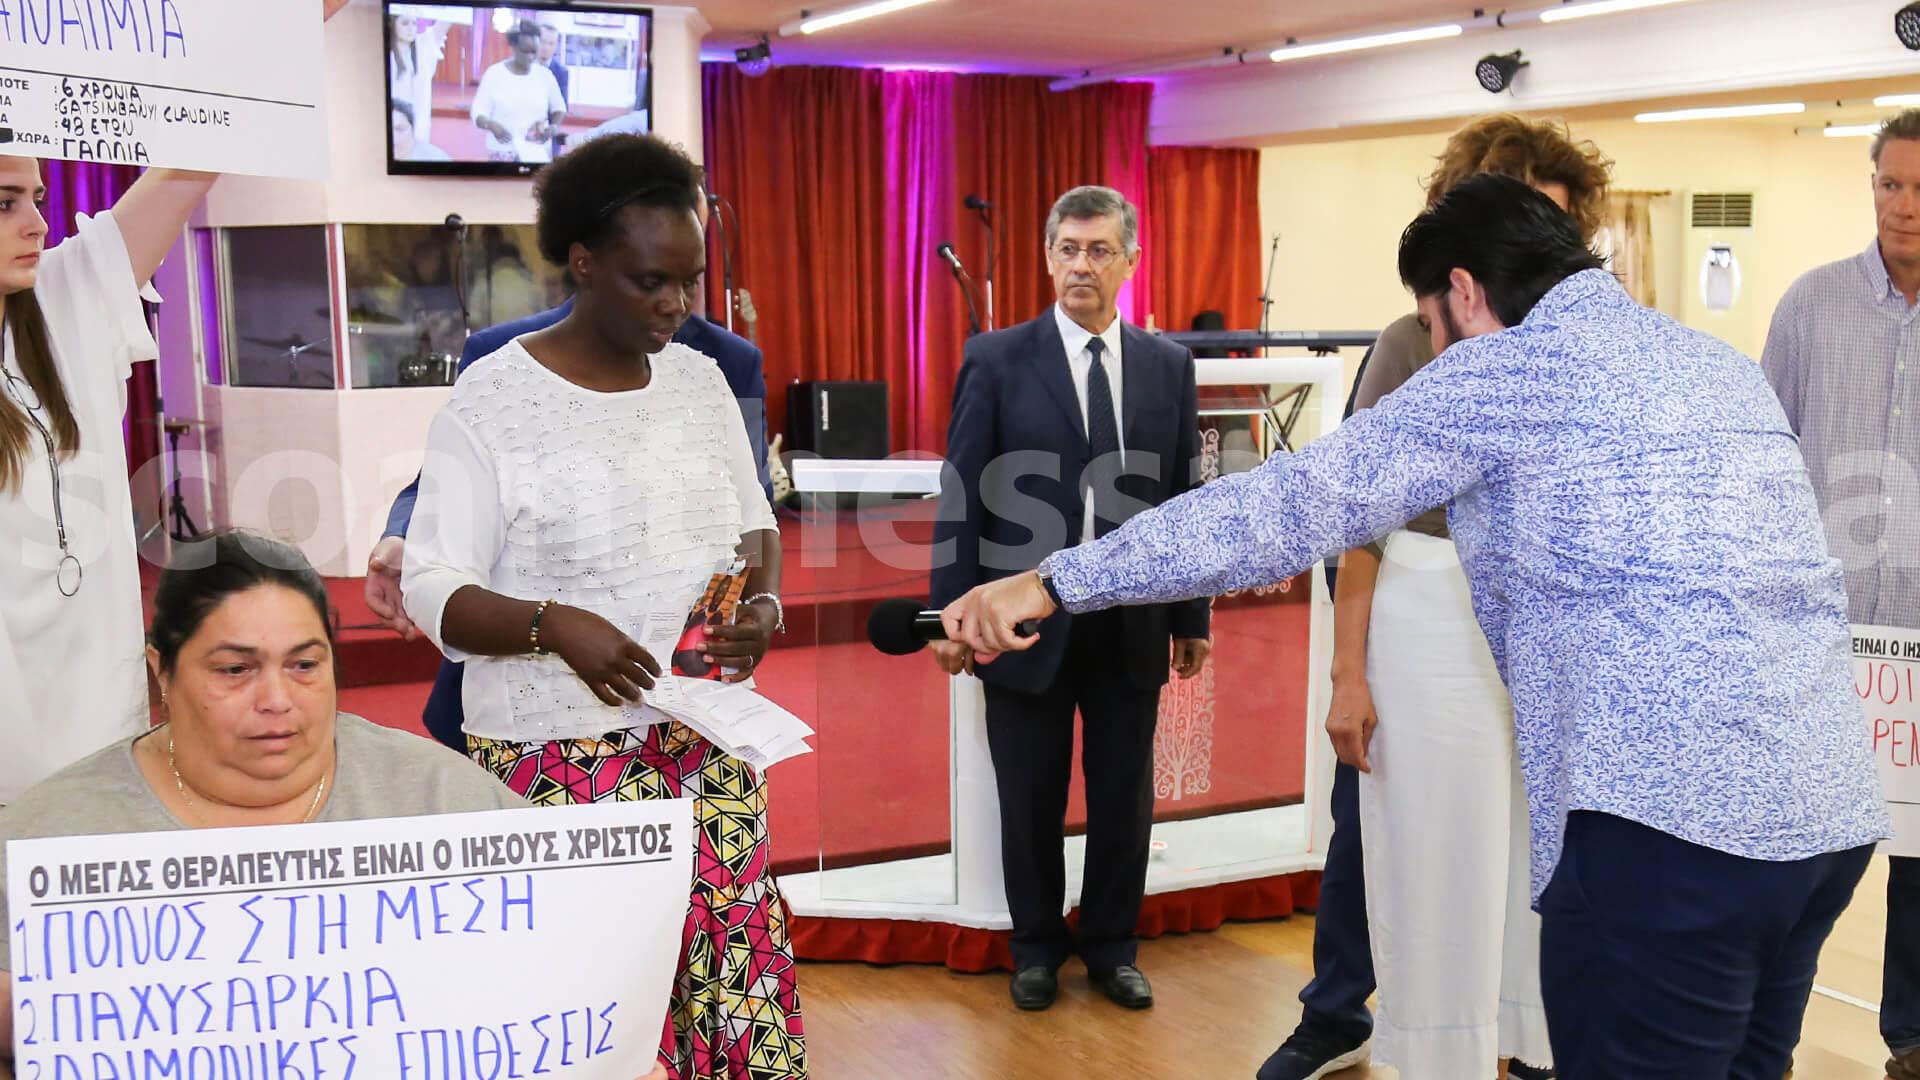 PRAYER_MS_GATSIMBANYI_CLAUDINE_2018_09_09